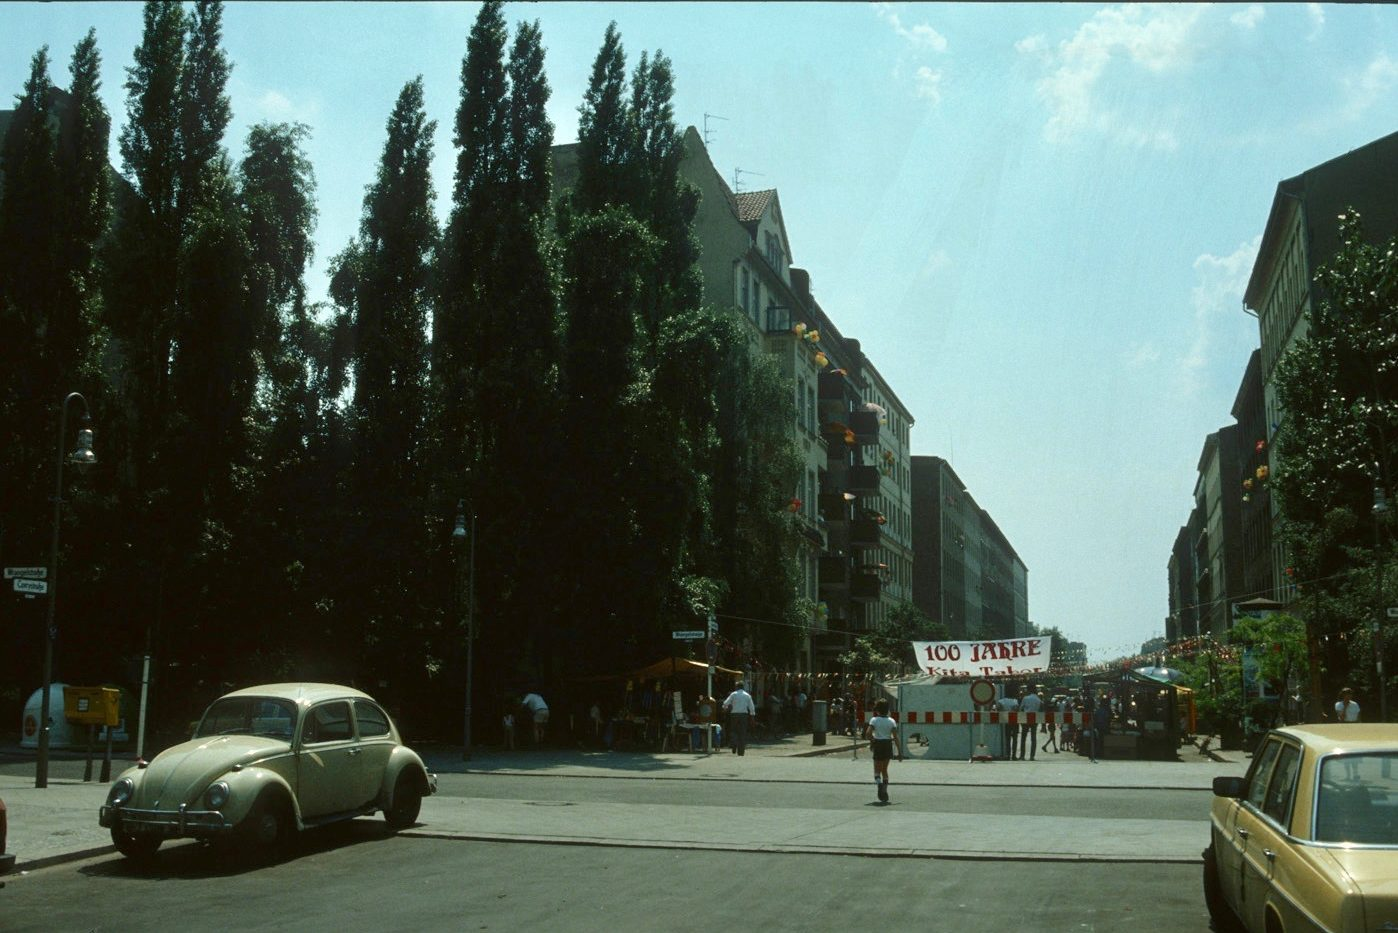 Kreuzberg in den 1980er-Jahren: Demo in der Wrangelstraße, 1982. Foto: Kostas Kouvelis/FHXB Friedrichshain-Kreuzberg Museum/CC BY 4.0